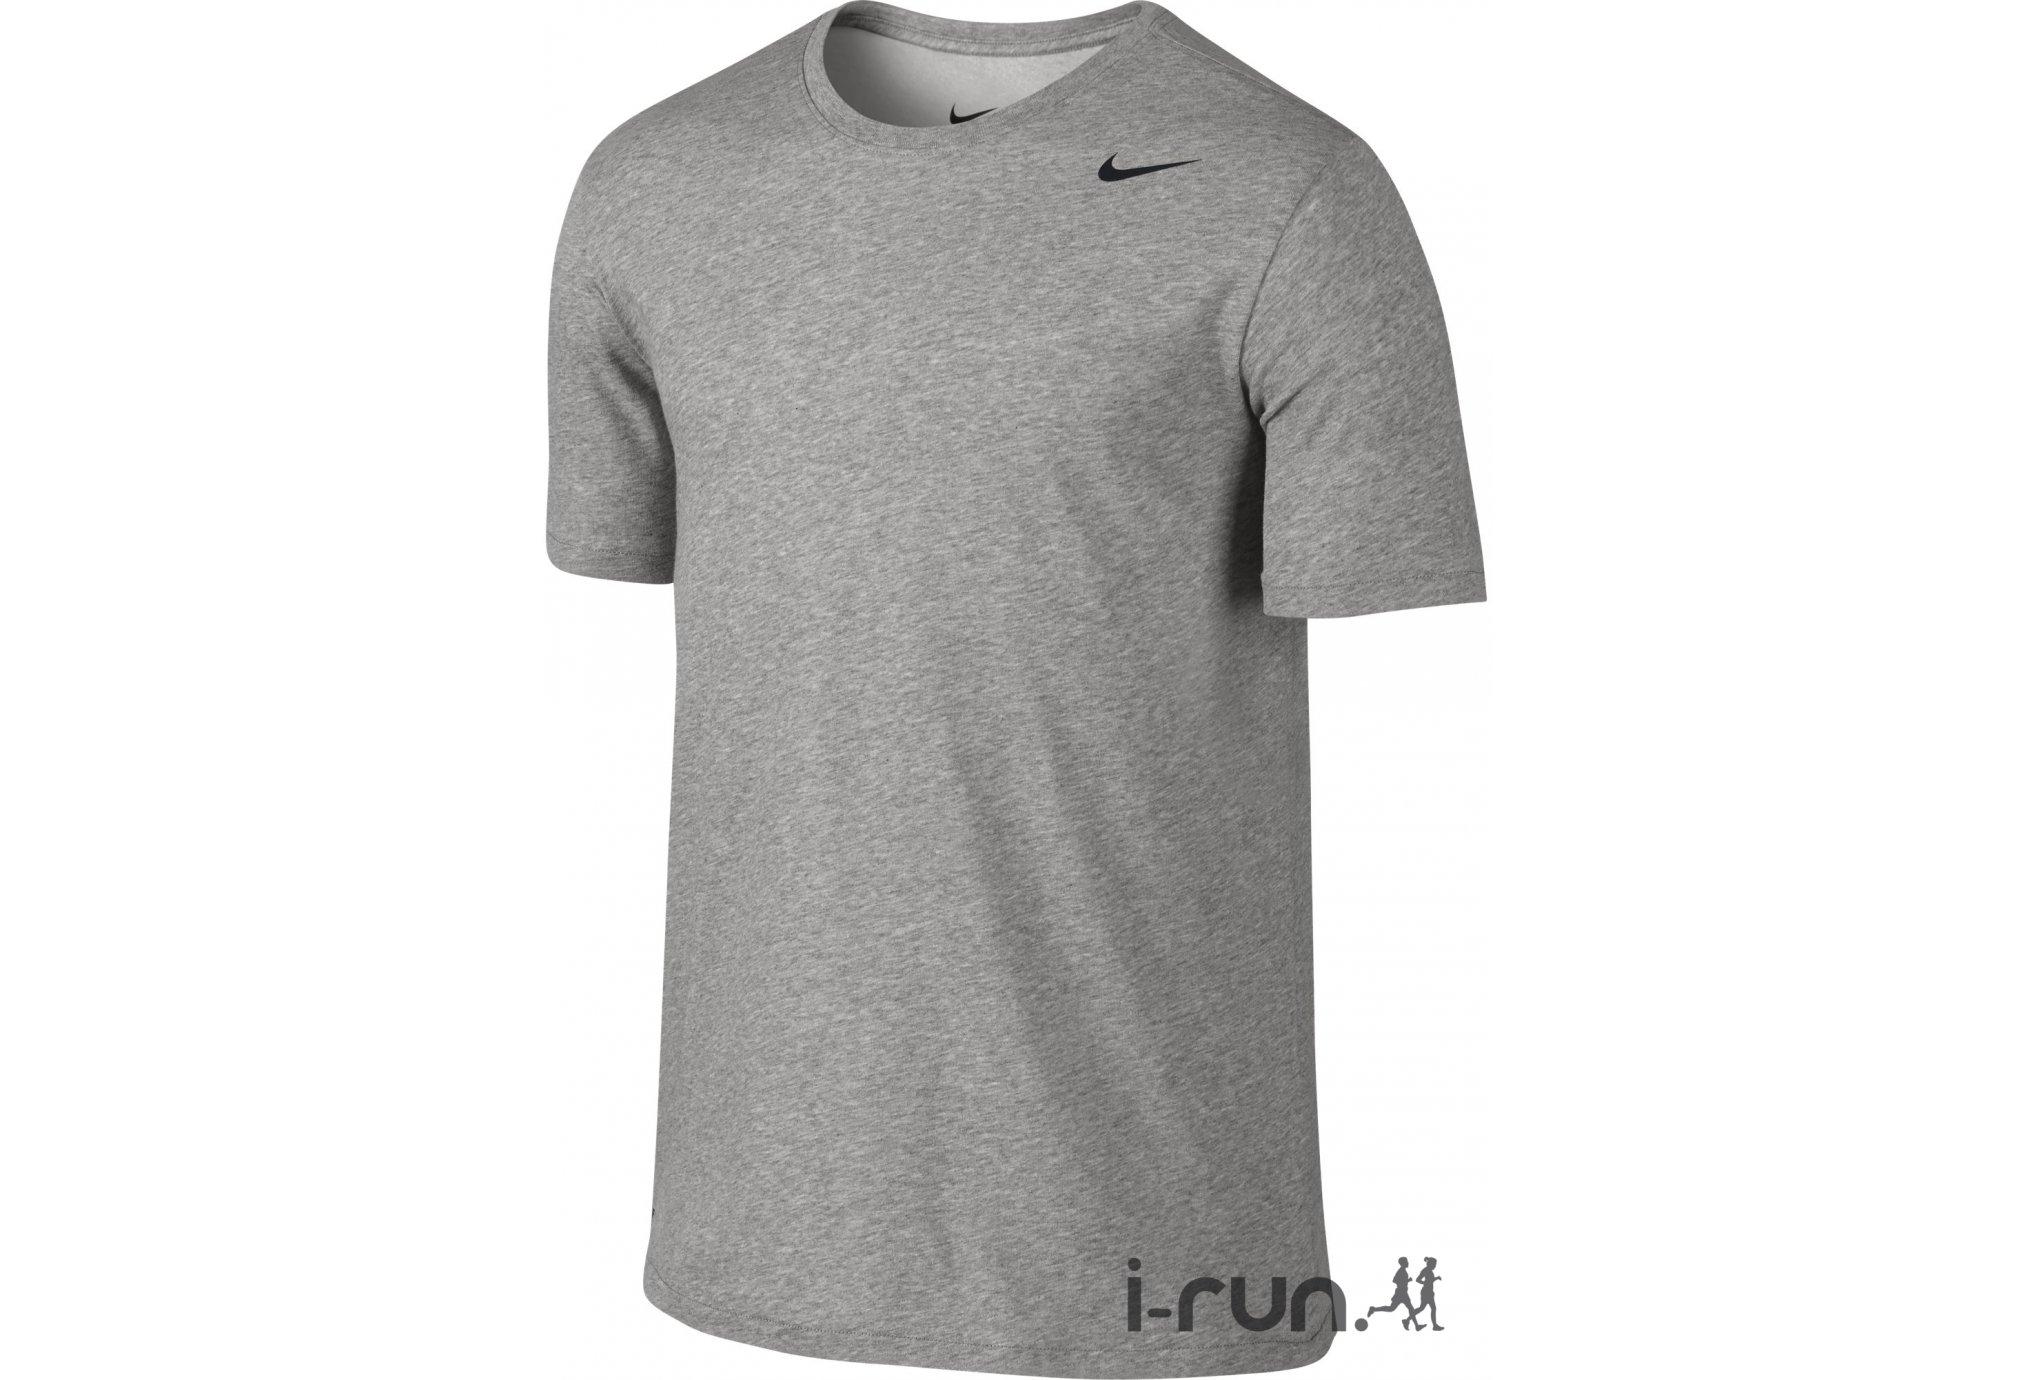 Nike Tee-Shirt Dri-Fit Cotton Version 2.0 M vêtement running homme